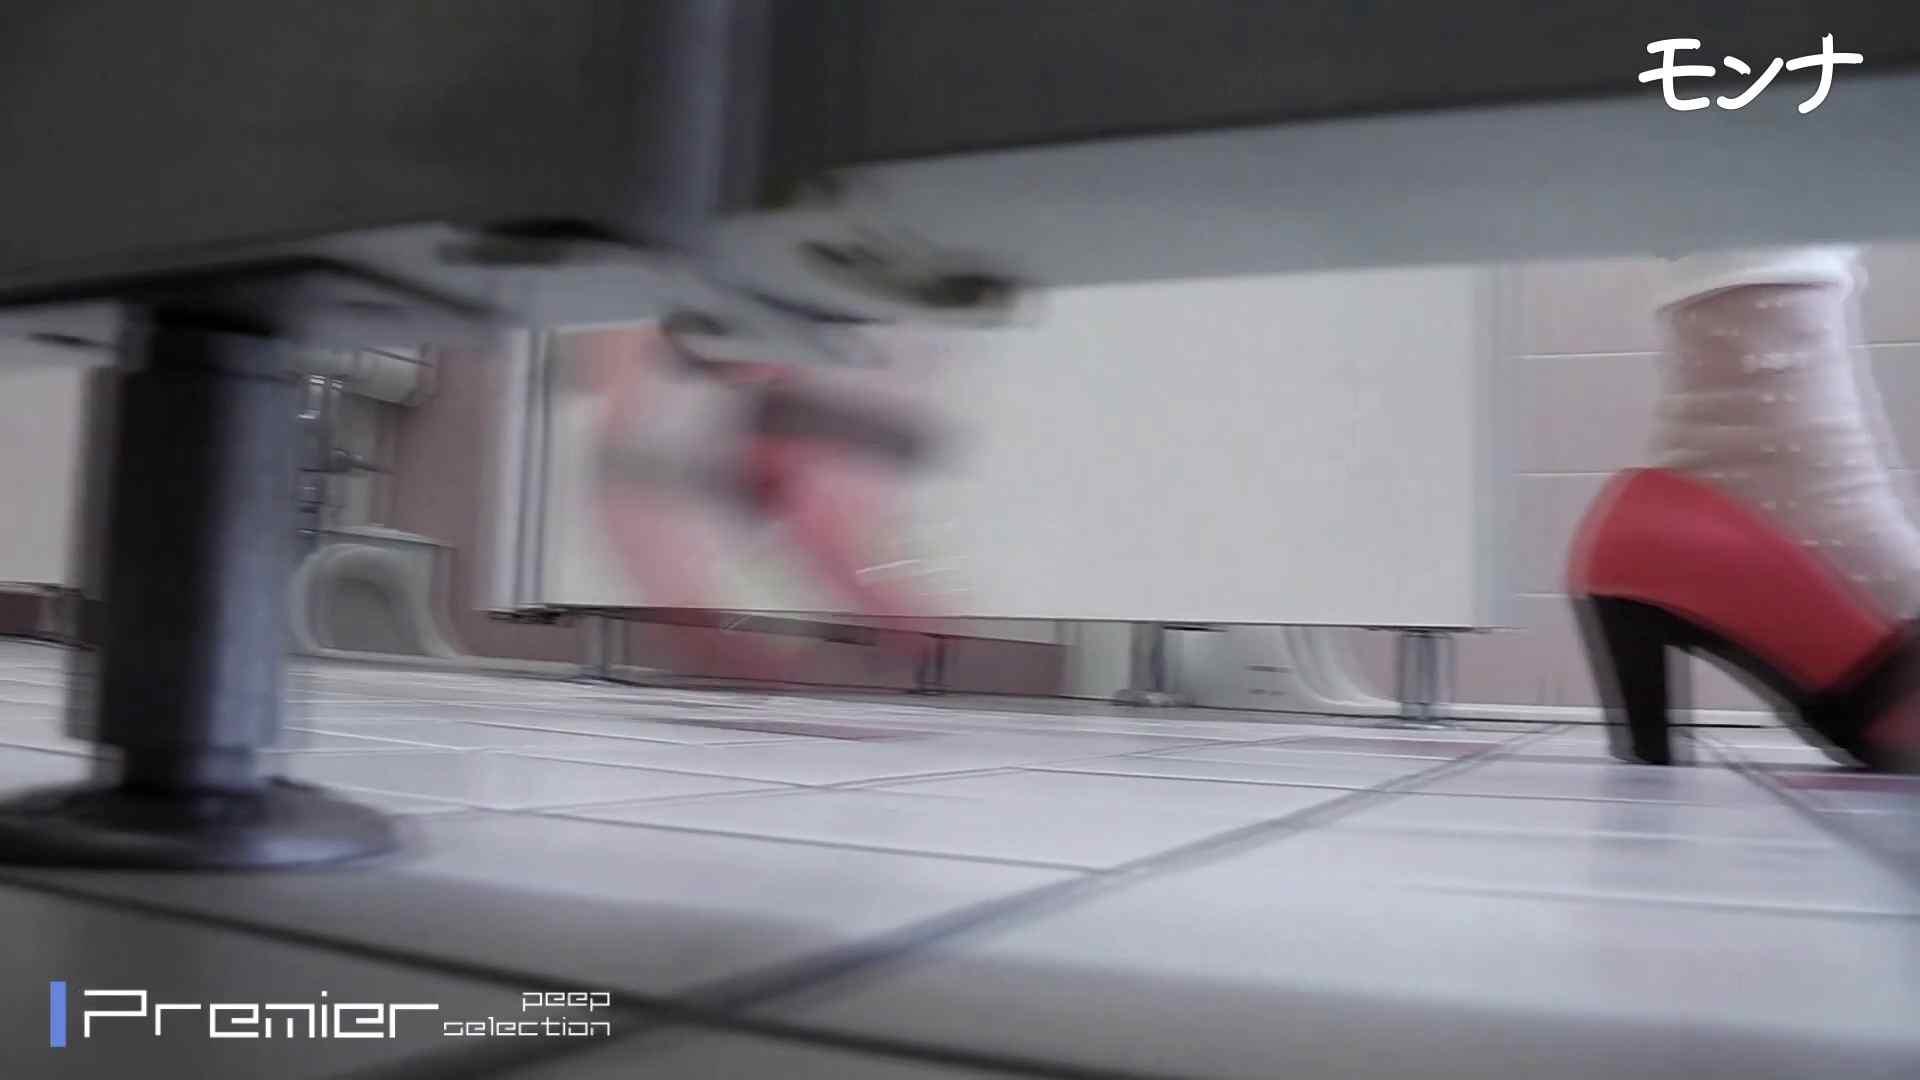 CM 悶絶シリーズ5 【美しい日本の未来 No.128】 むっちり体型 戯れ無修正画像 88画像 49